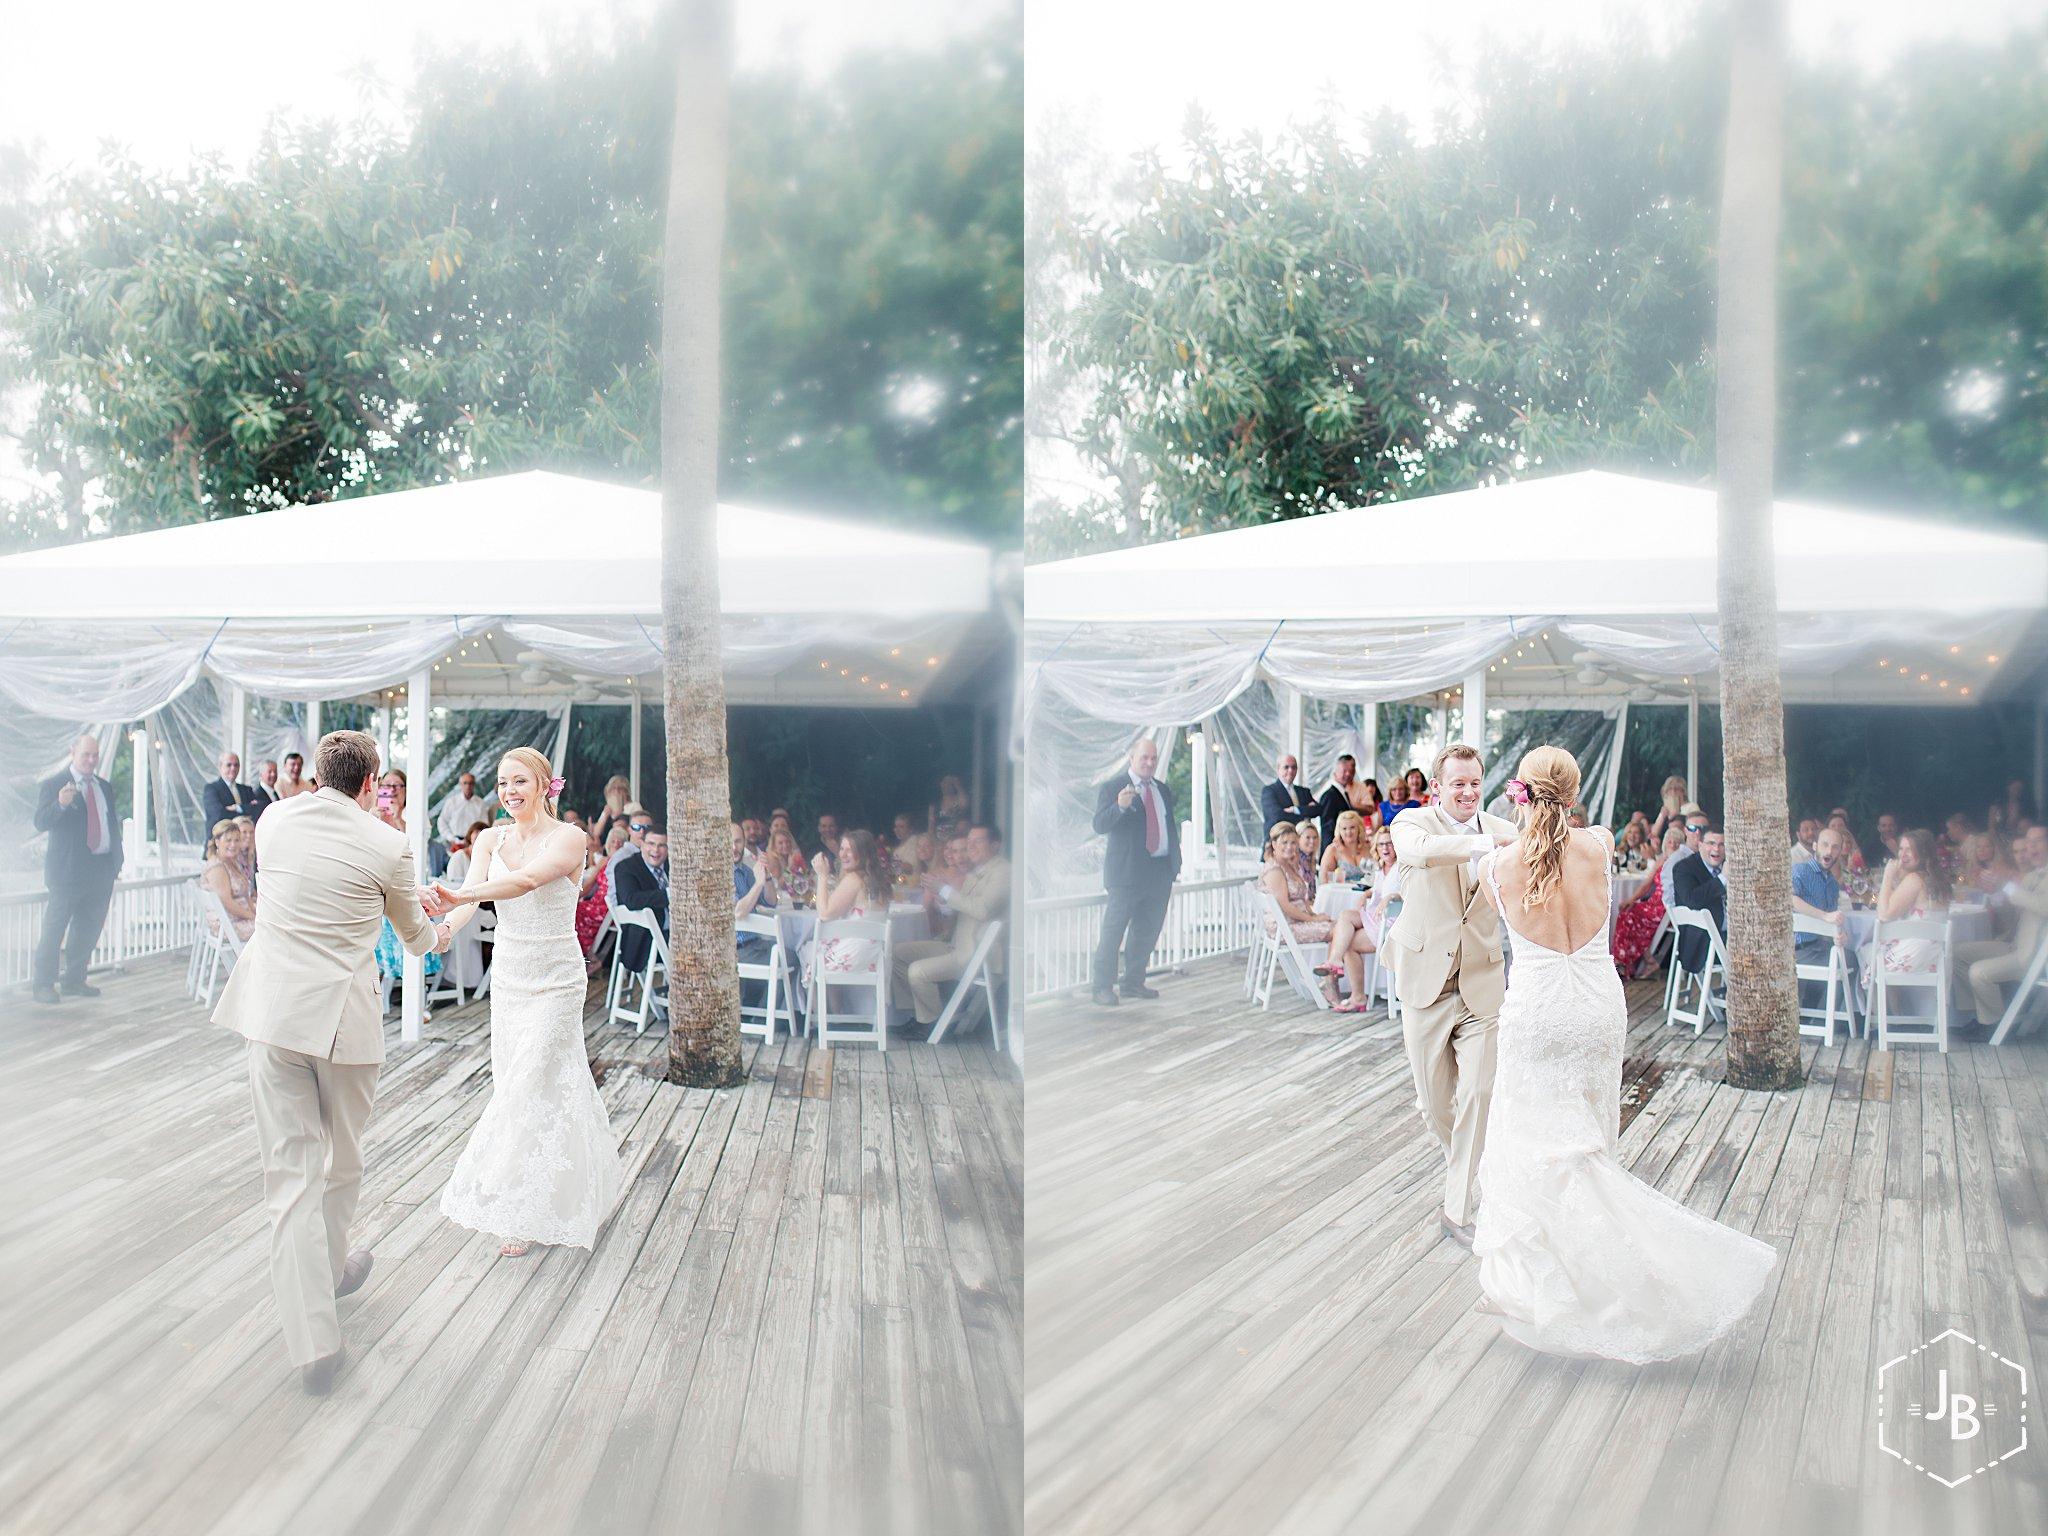 WeddingandEngagementFloridaPhotographer_2086.jpg